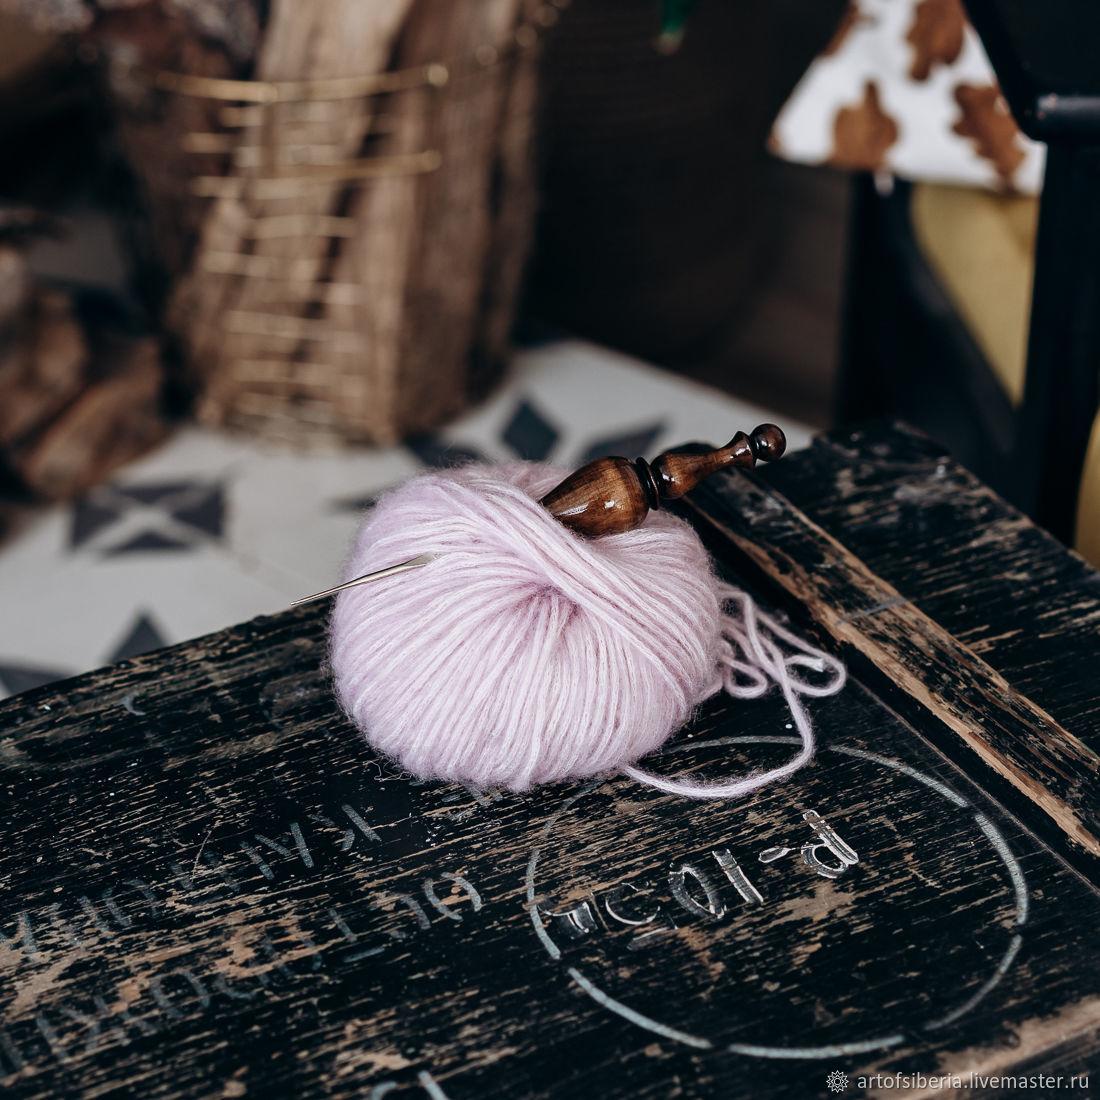 1,25 mm iron crochet hook with wooden handle (cedar) K218, Crochet Hooks, Novokuznetsk,  Фото №1